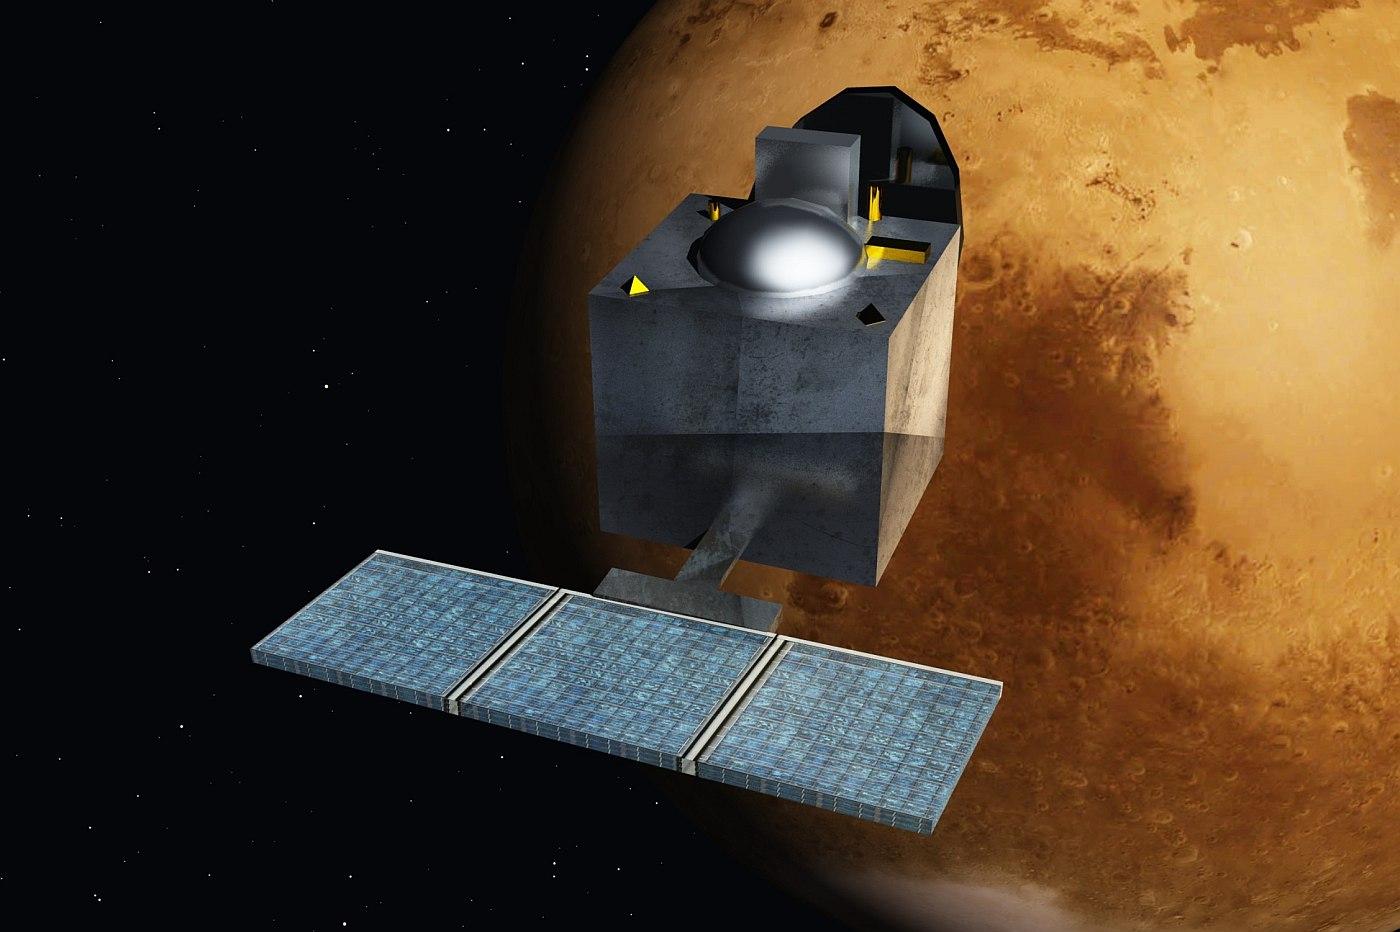 Mangalyaan (Mars Orbiter Mission)